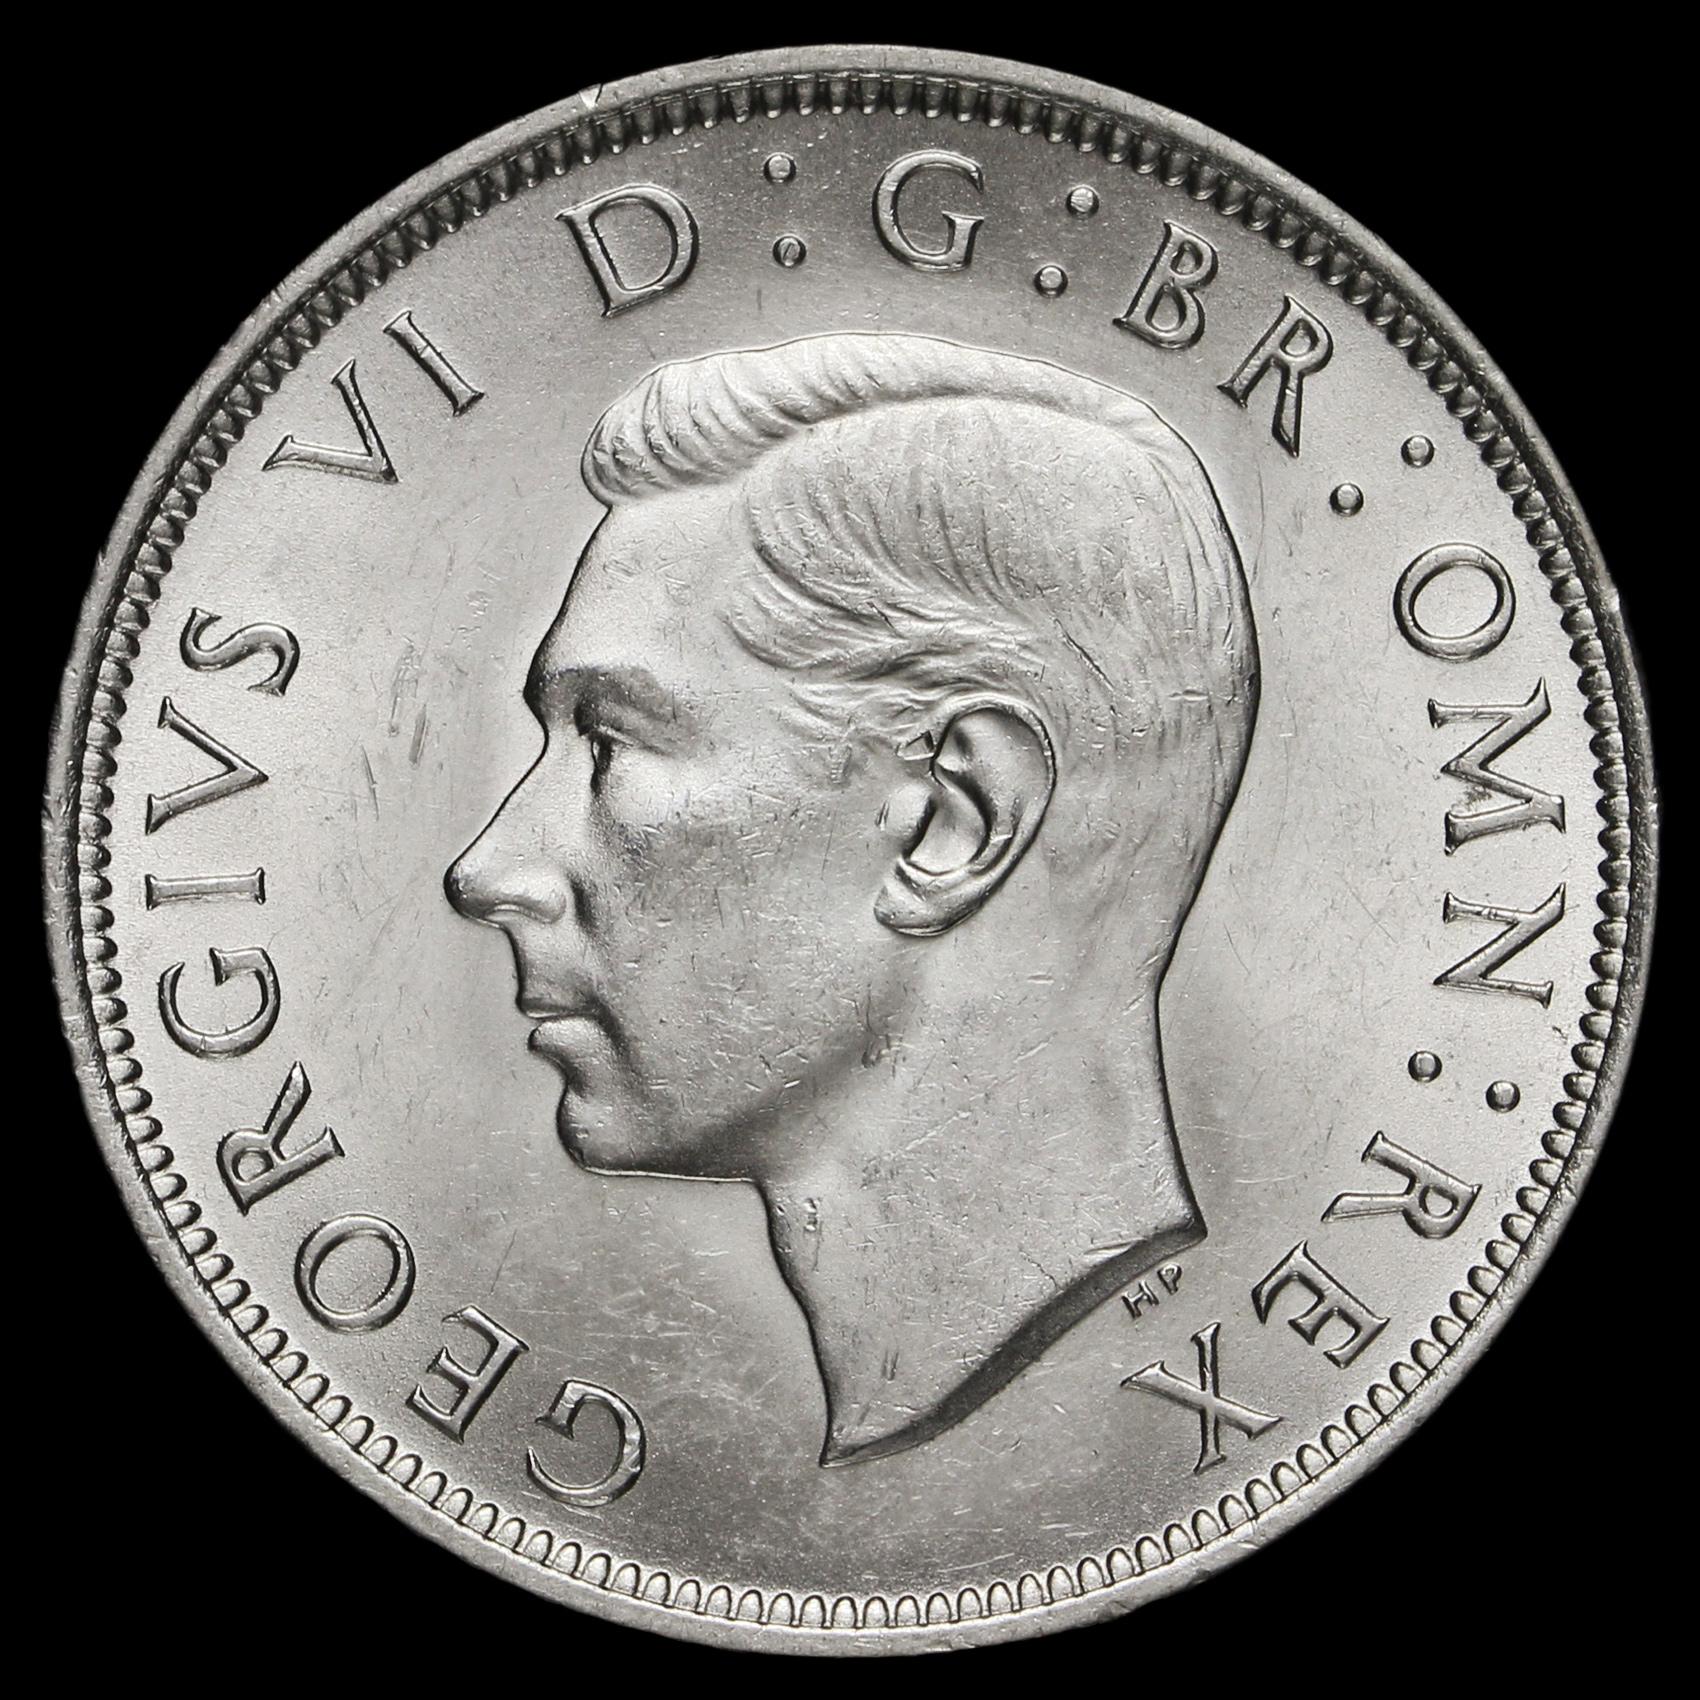 1940 half crown coin